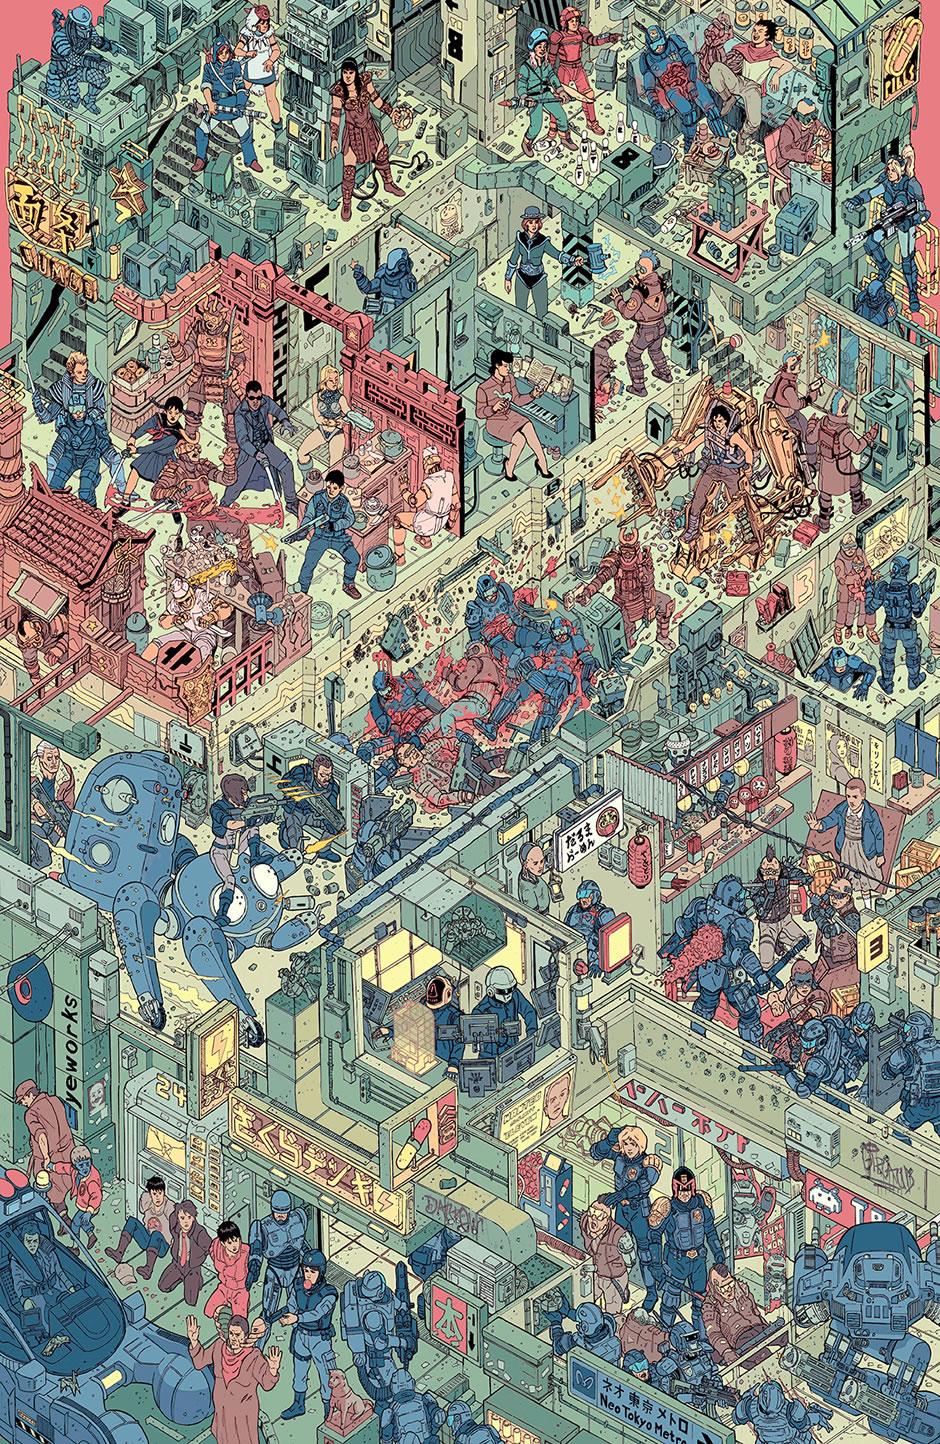 poster-the-raid-cyberpunk-fanart-1